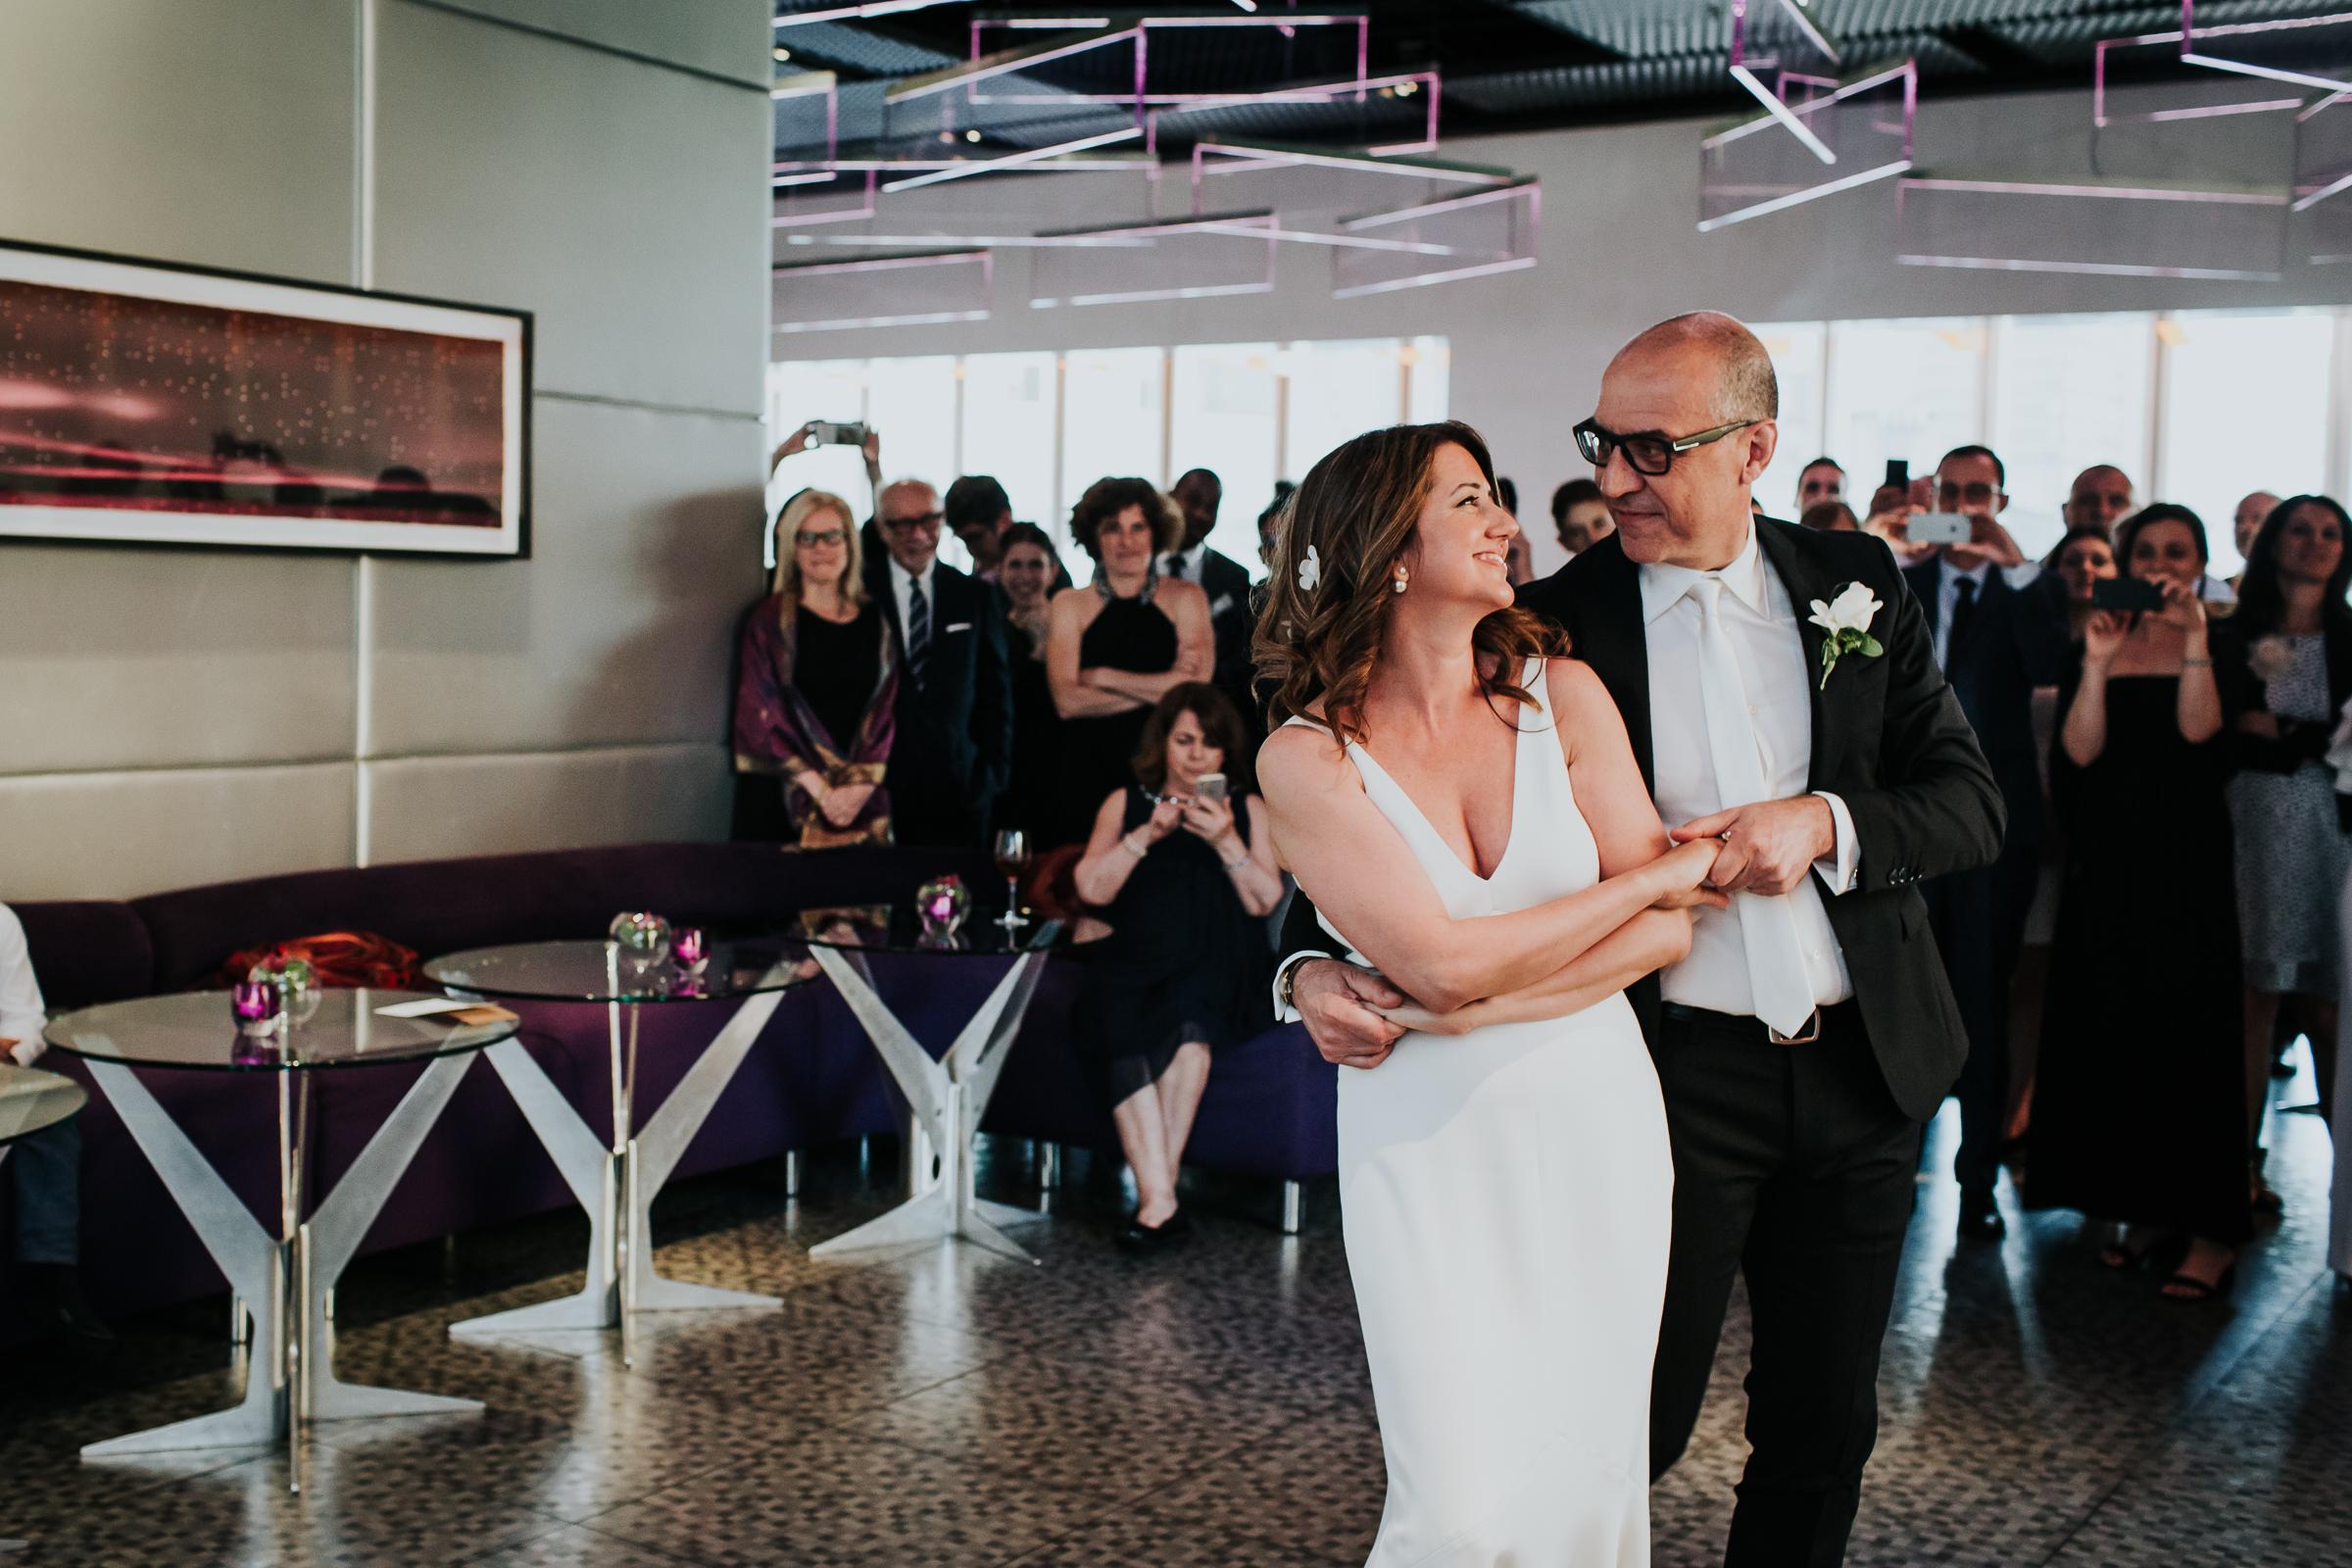 Robert-NYC-Museum-Of-Arts-&-Design-Greek-Italian-New-York-Documentary-Wedding-Photographer-62.jpg